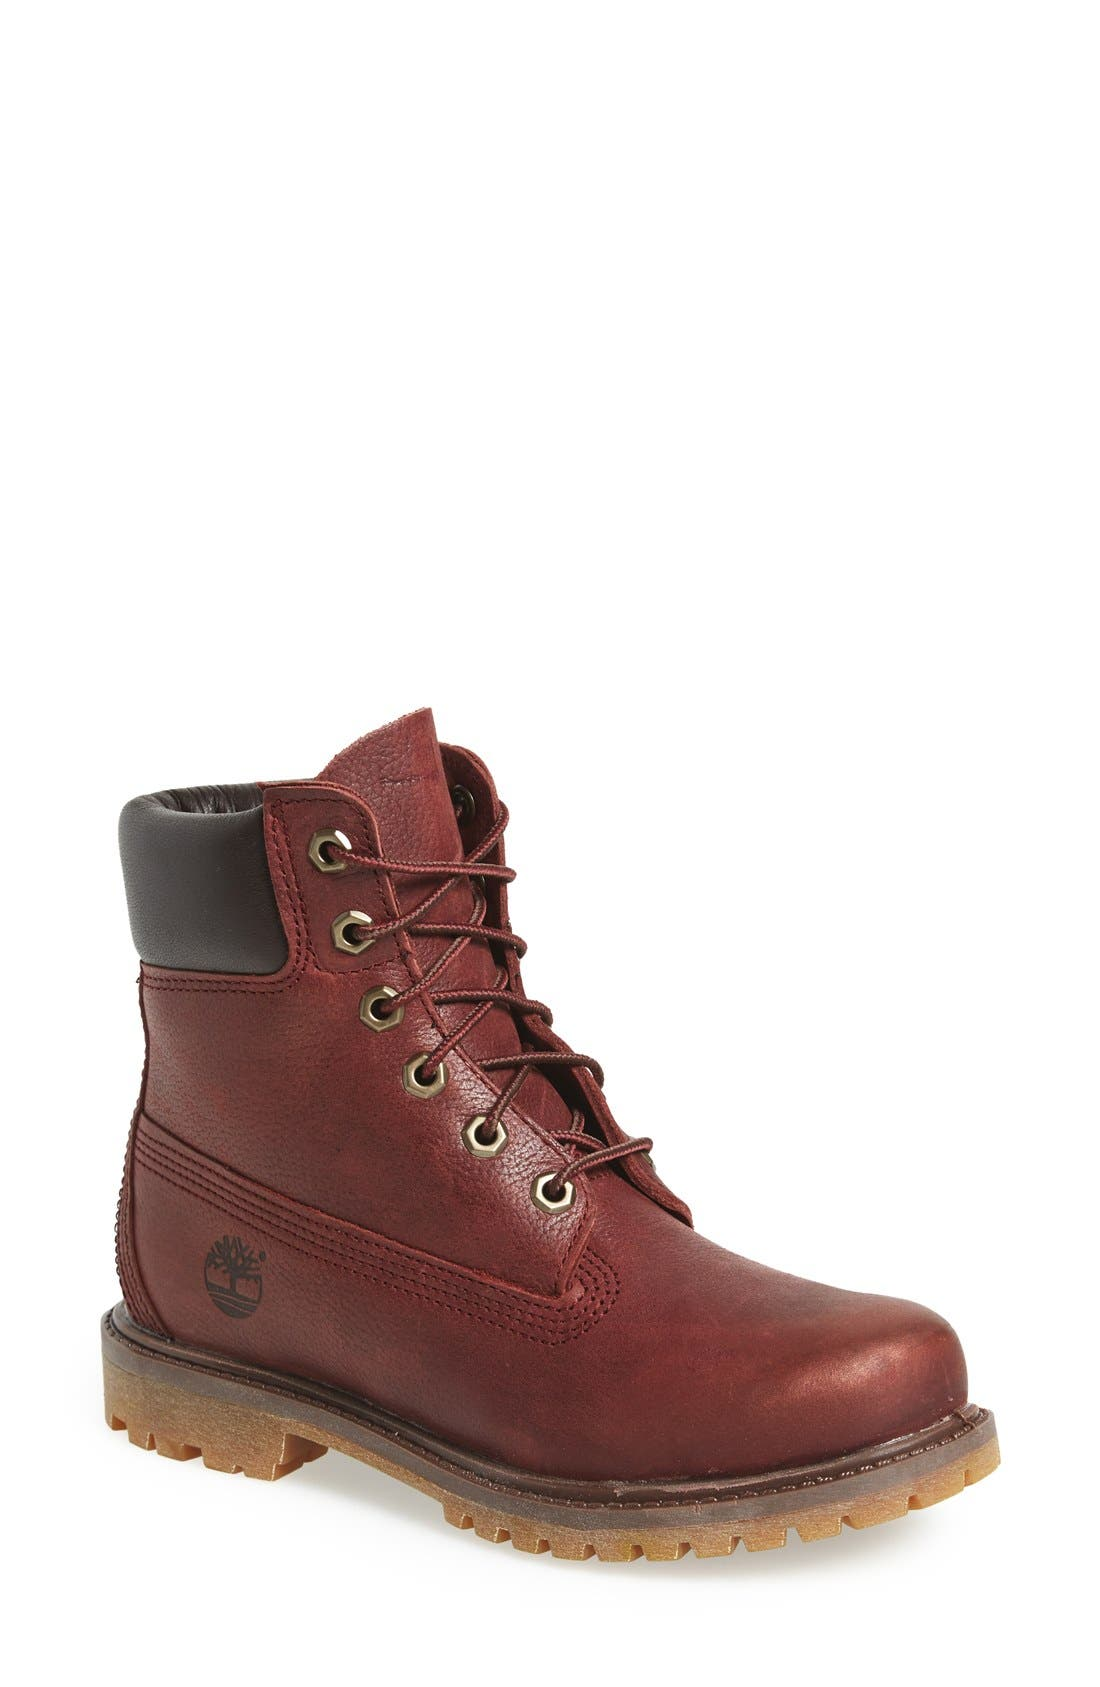 timberland women's 6 inch premium waterproof boots